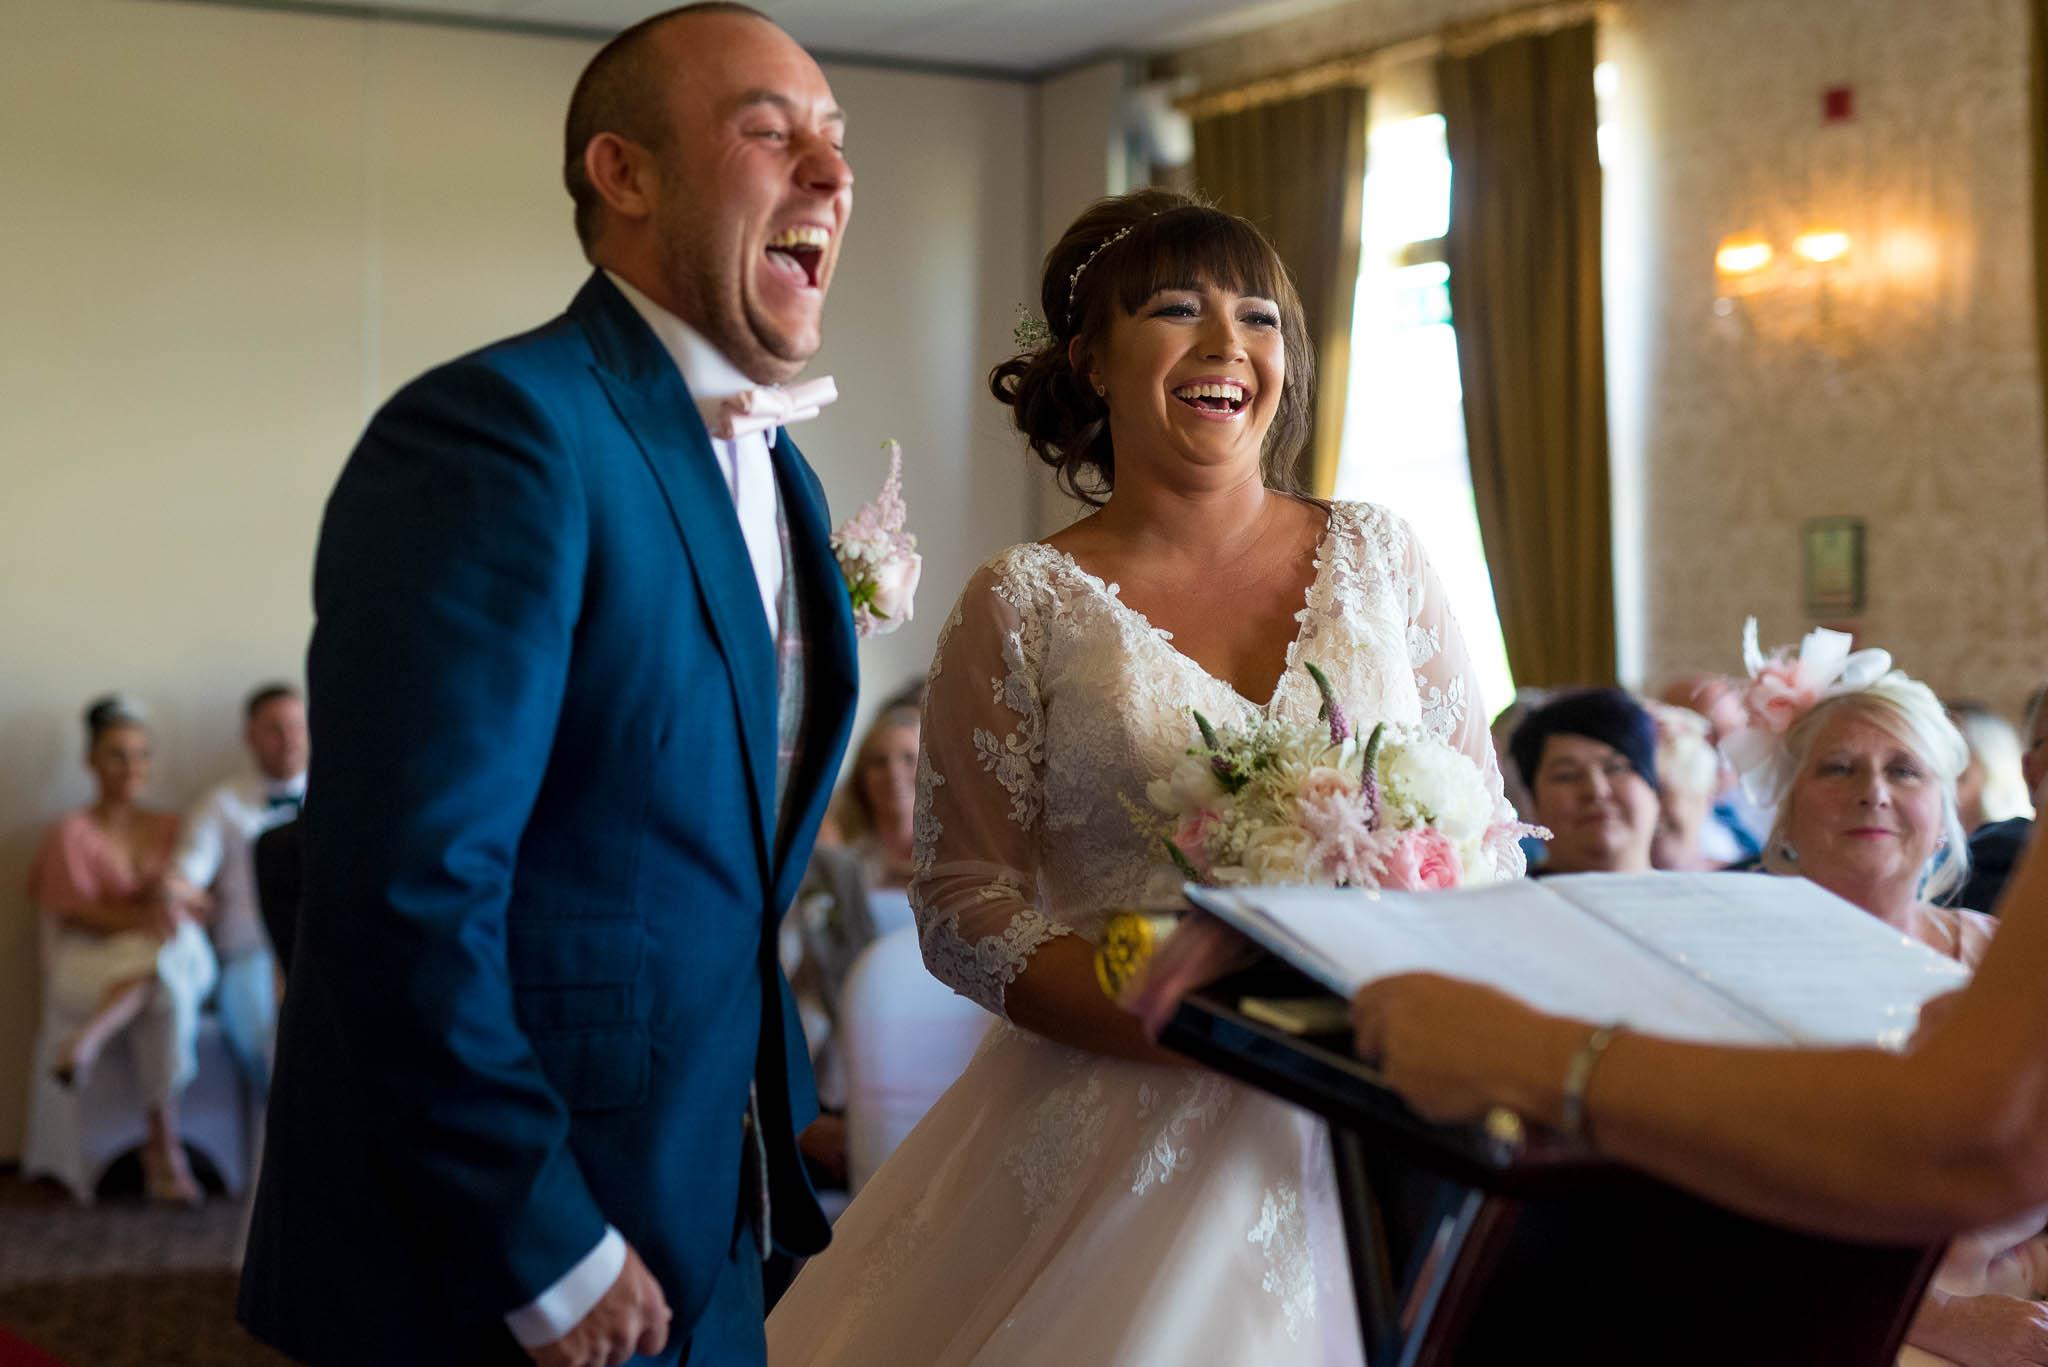 Darrington Golf Club Wedding Photographer69.jpg